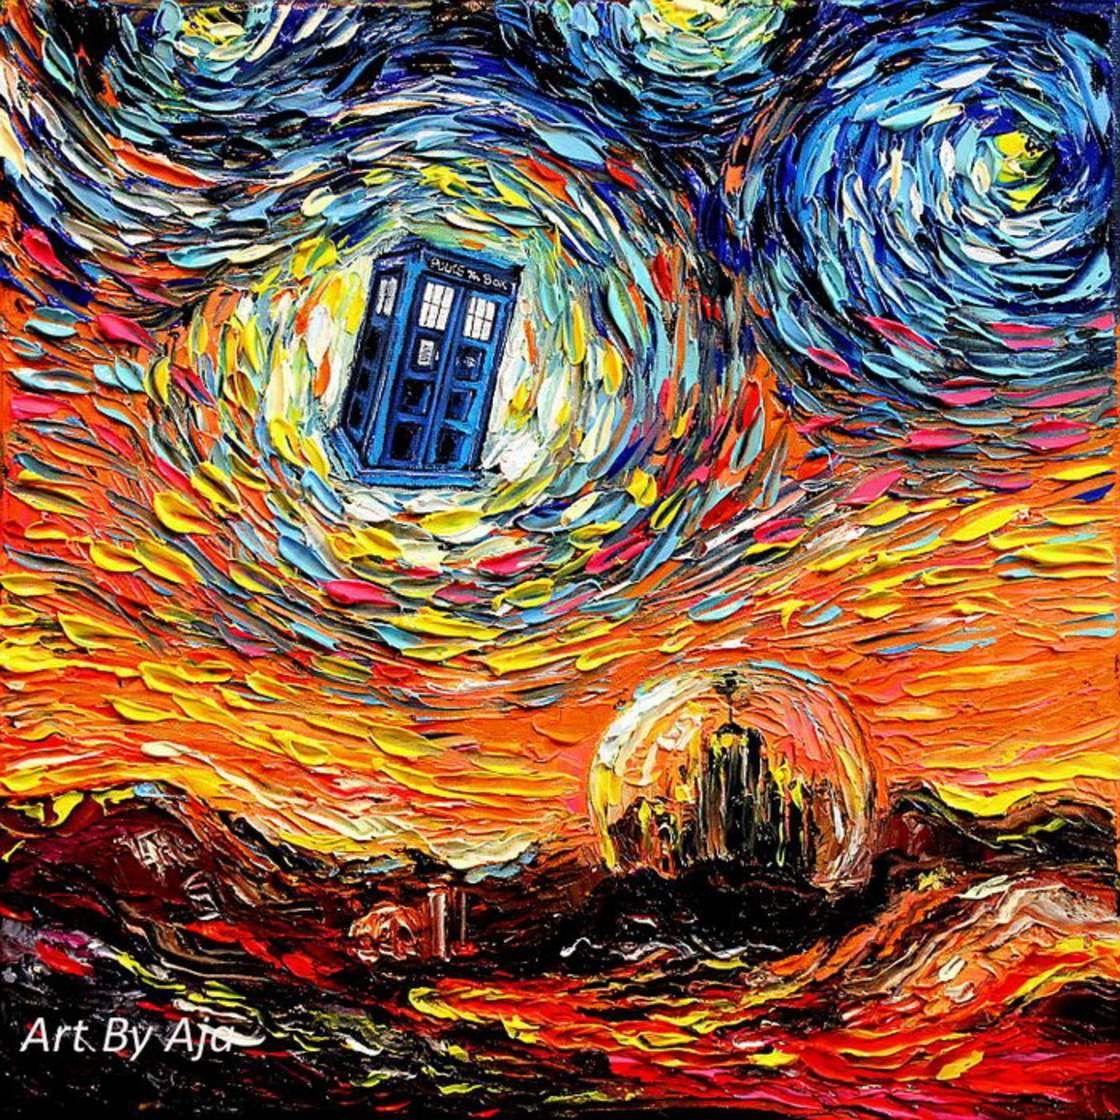 Starry Night When Van Gogh Meets Pop Culture